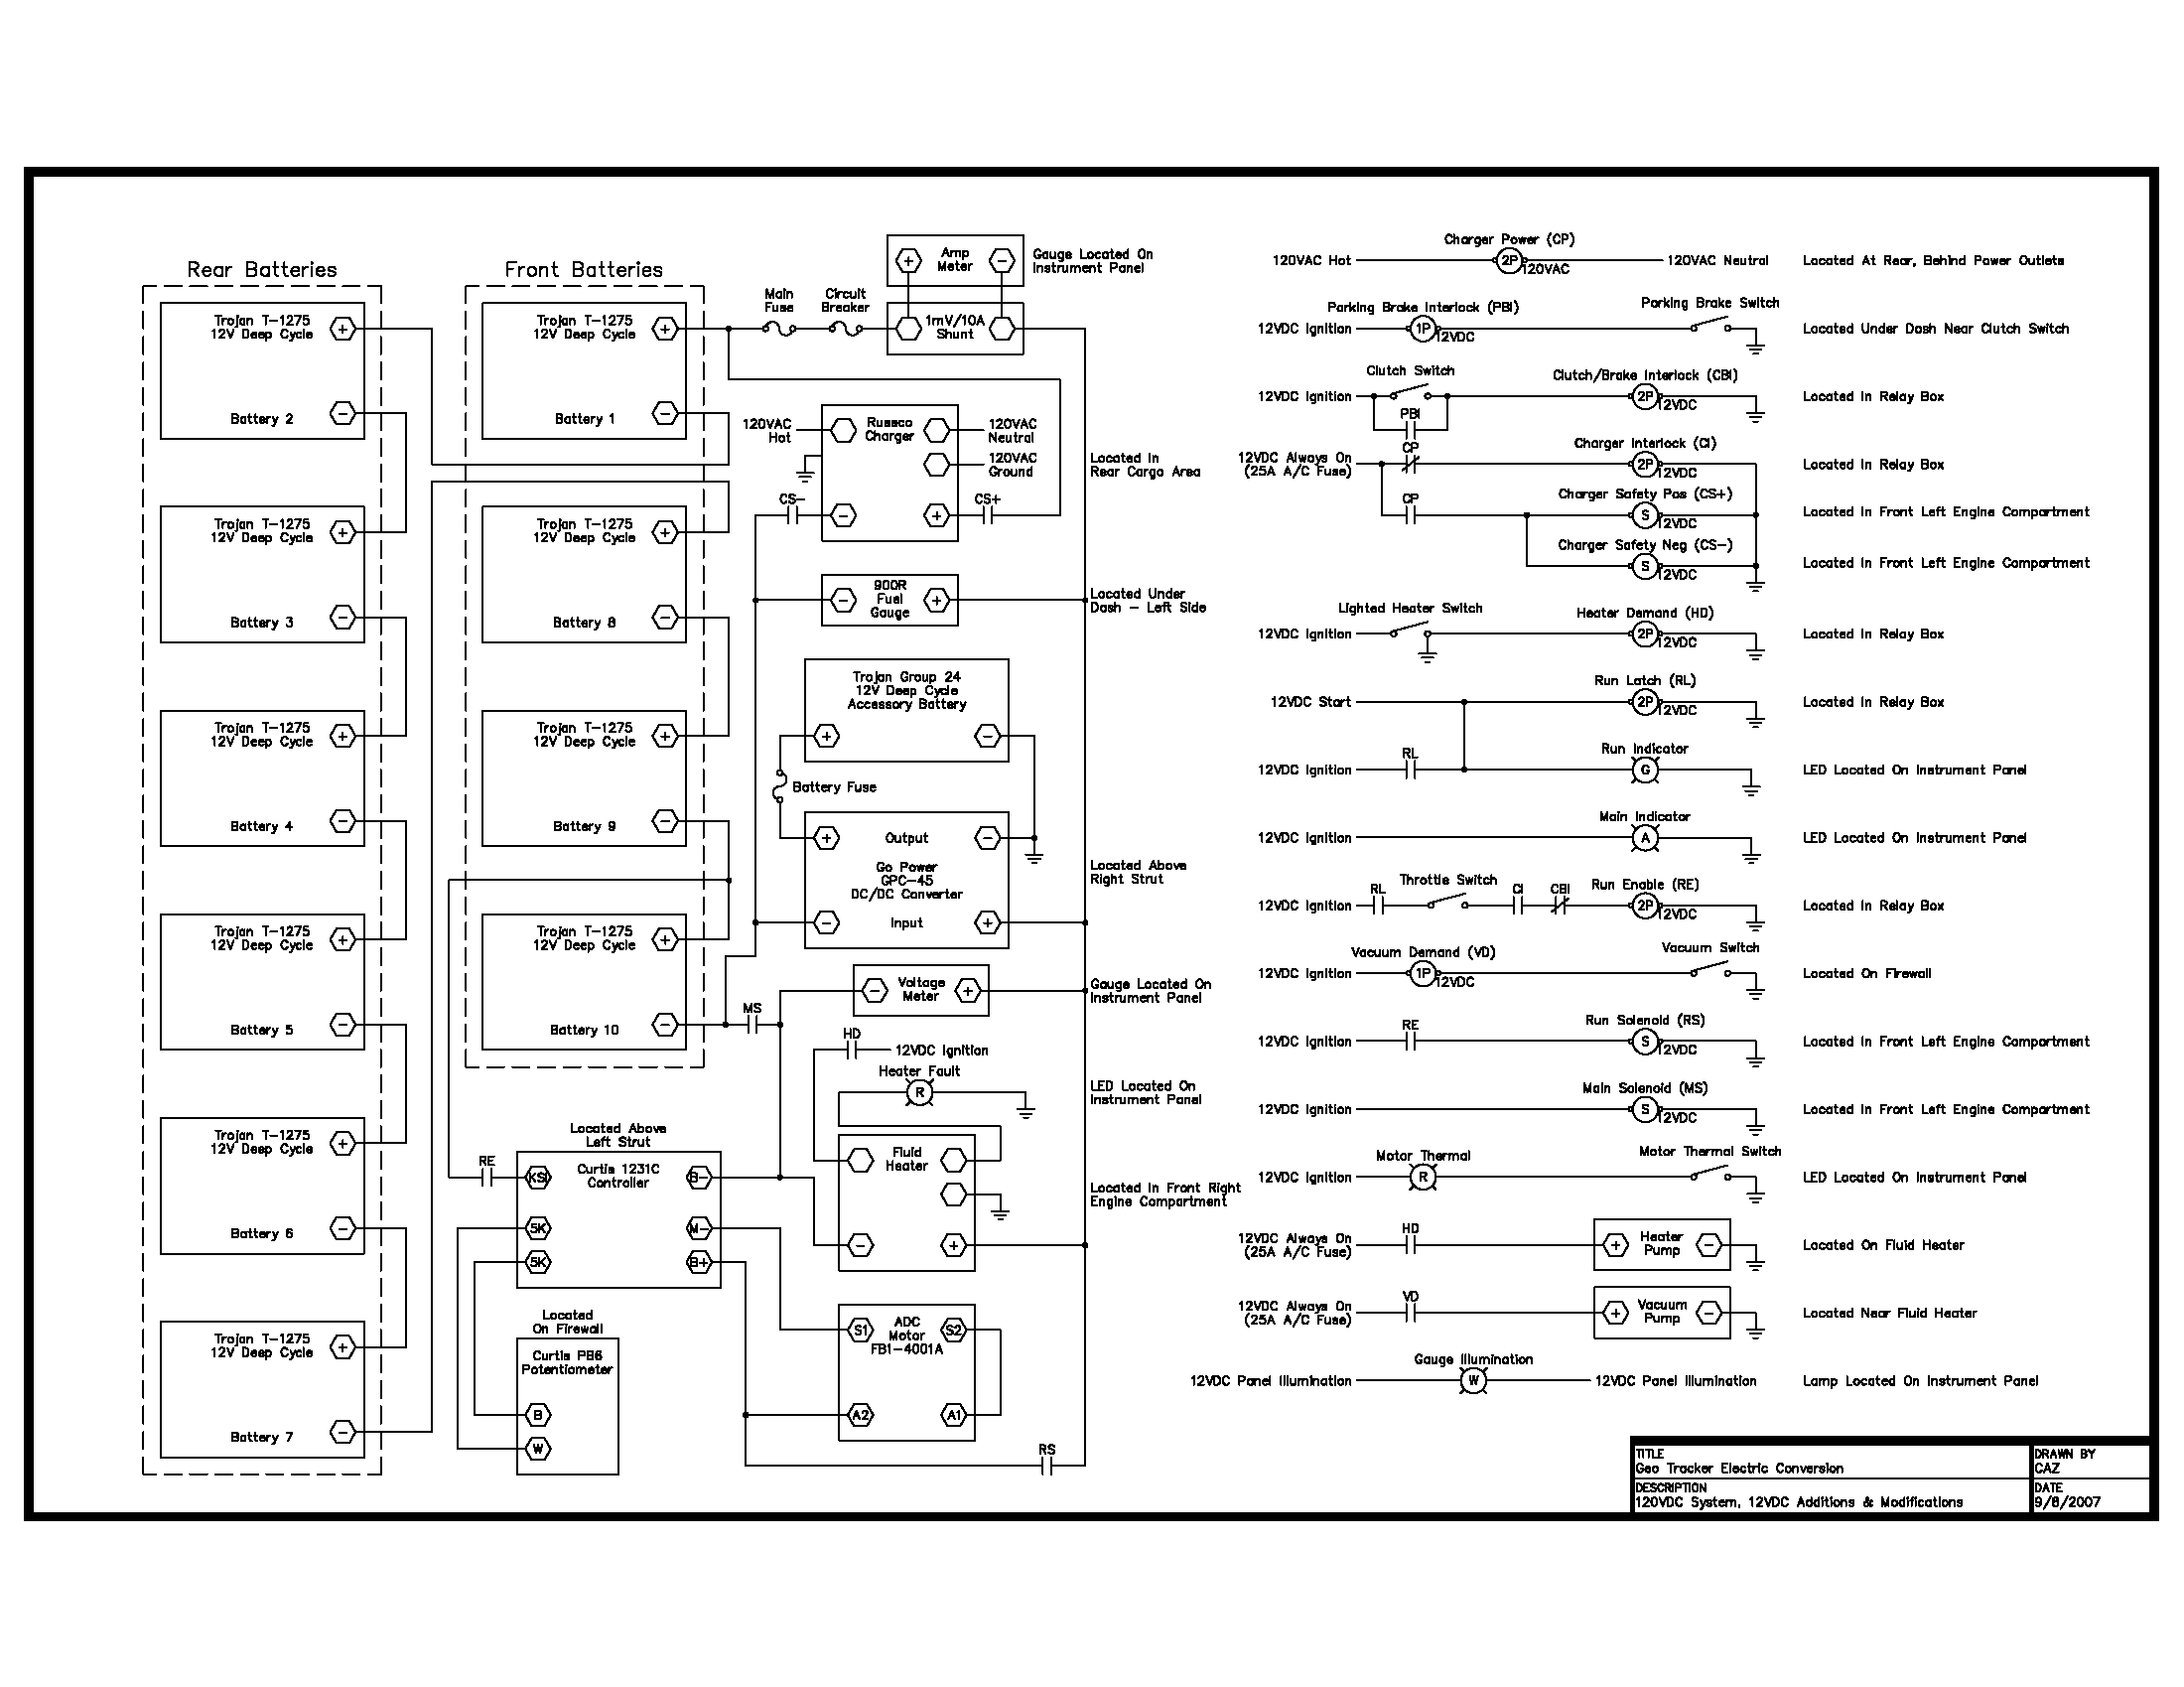 Electrical Wiring Diagram Automotive | Wiring Library - Automotive Wiring Diagram Software